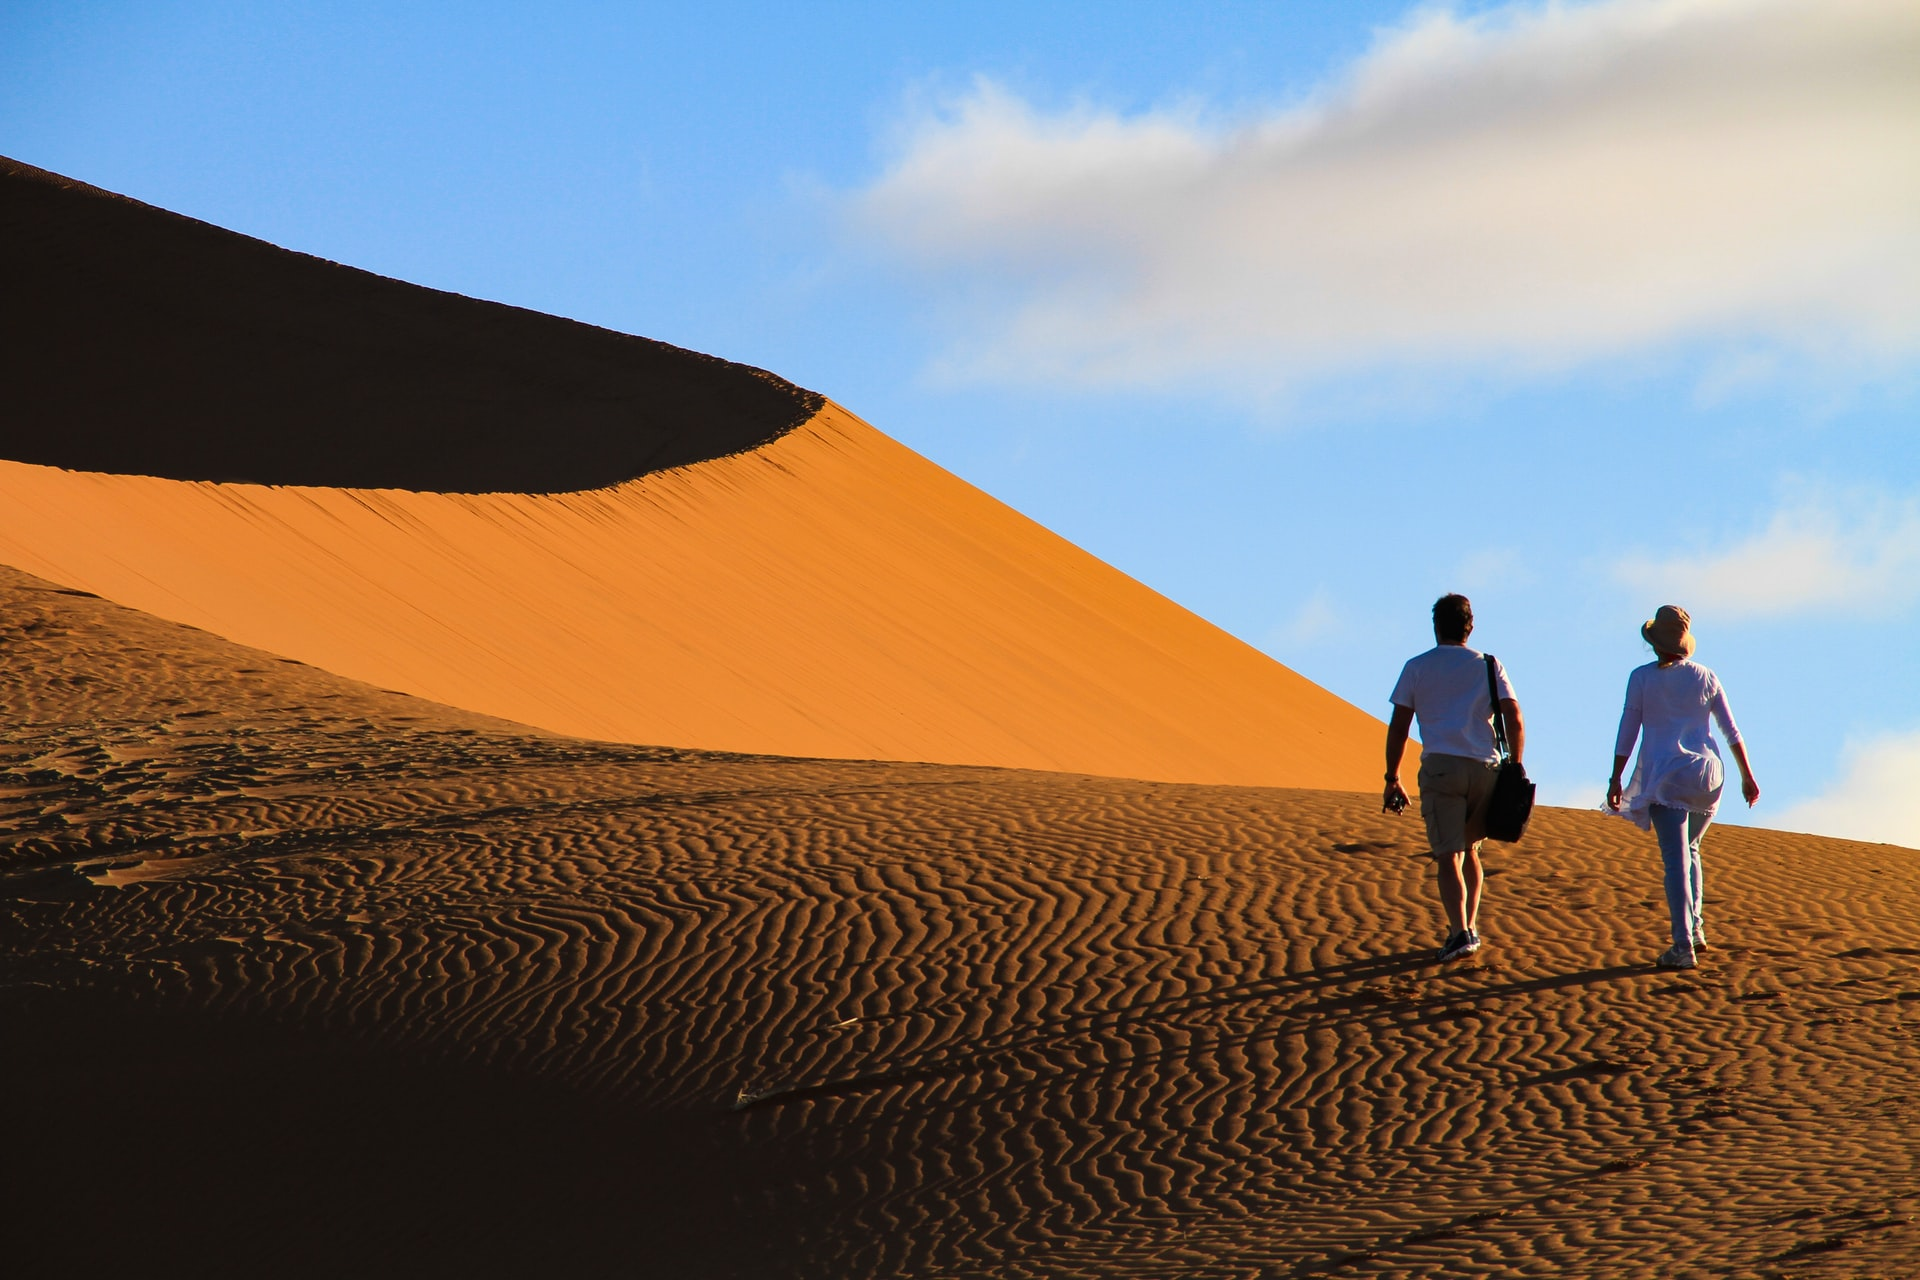 Walking in the dunes in morocco sahara desert- sahara desert camping - sahara desert activities